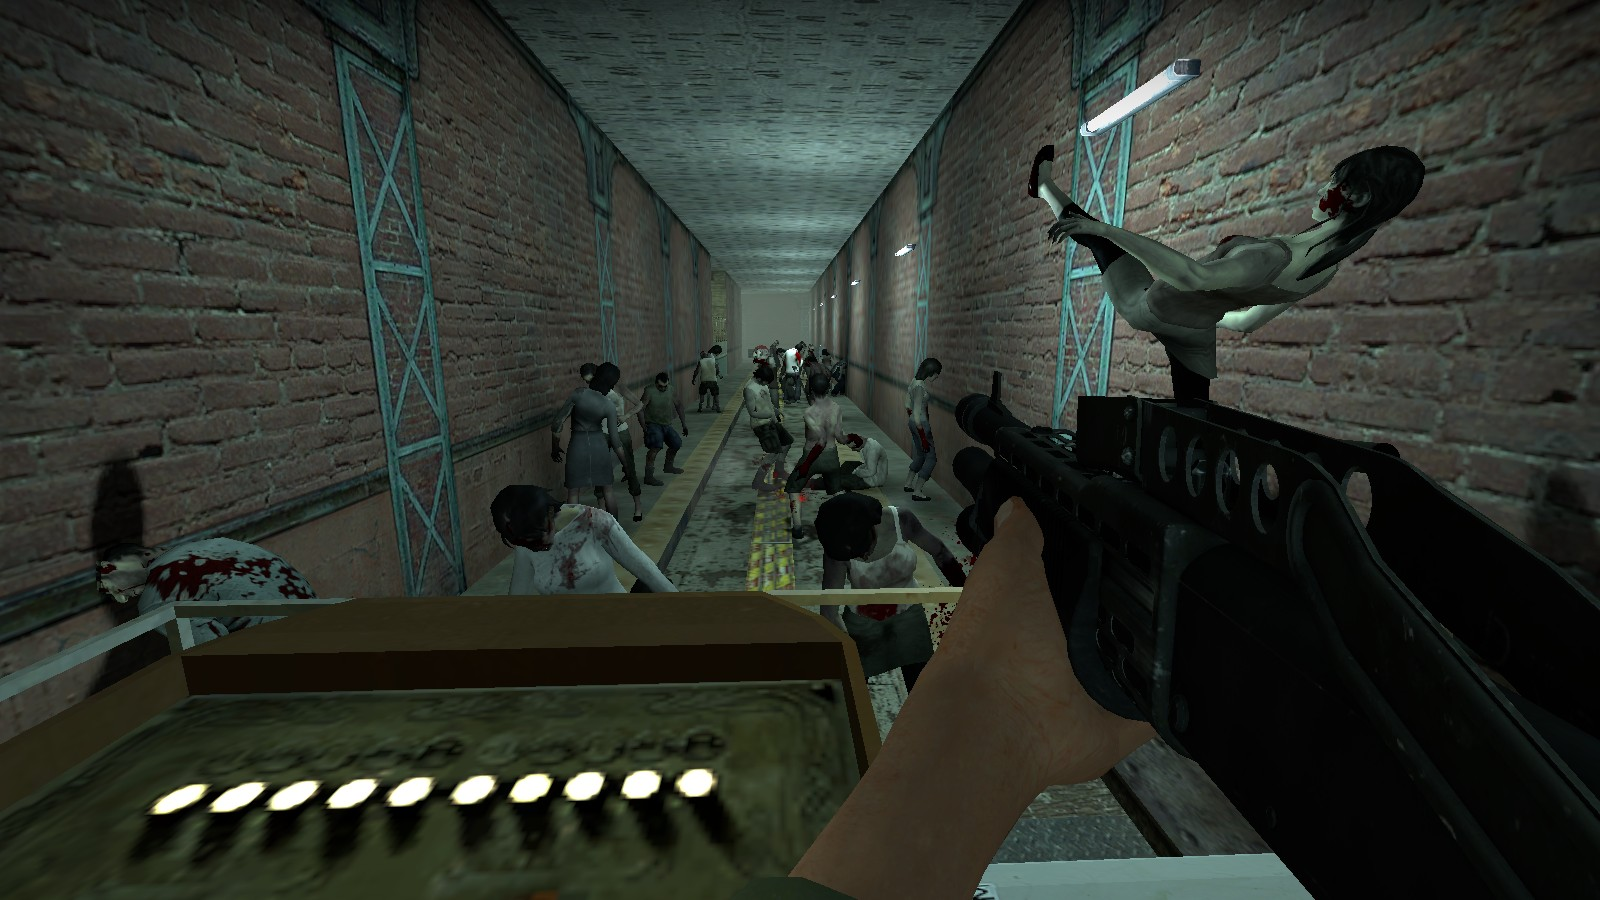 Claustrophobia Screenshots (view original)